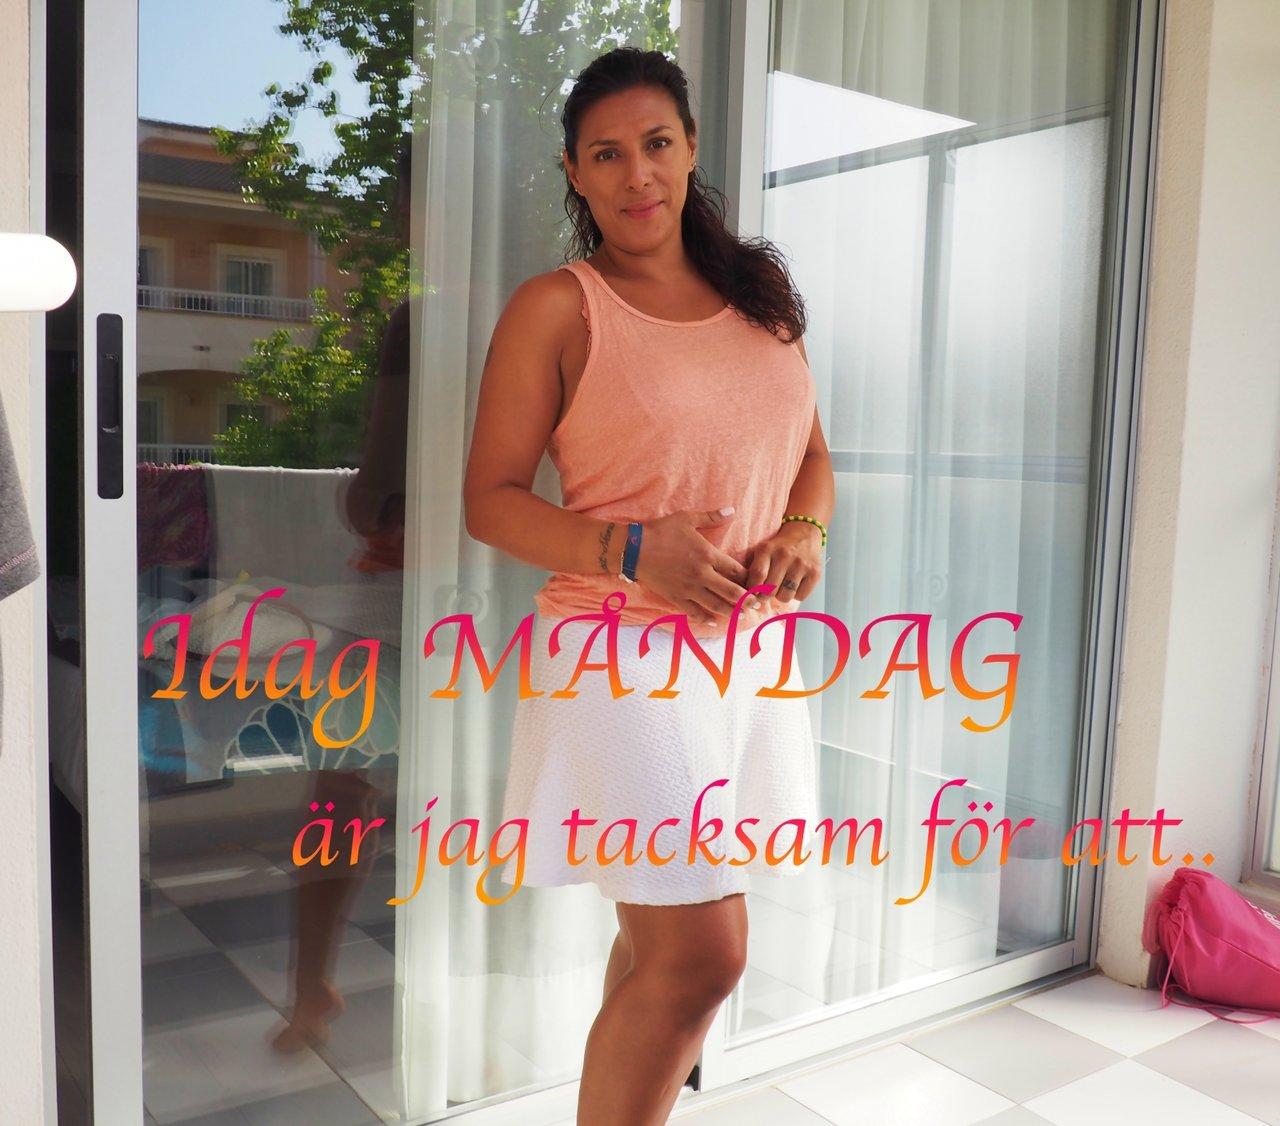 tacksamhet_mindfullness_mandag_nystart_bloggare